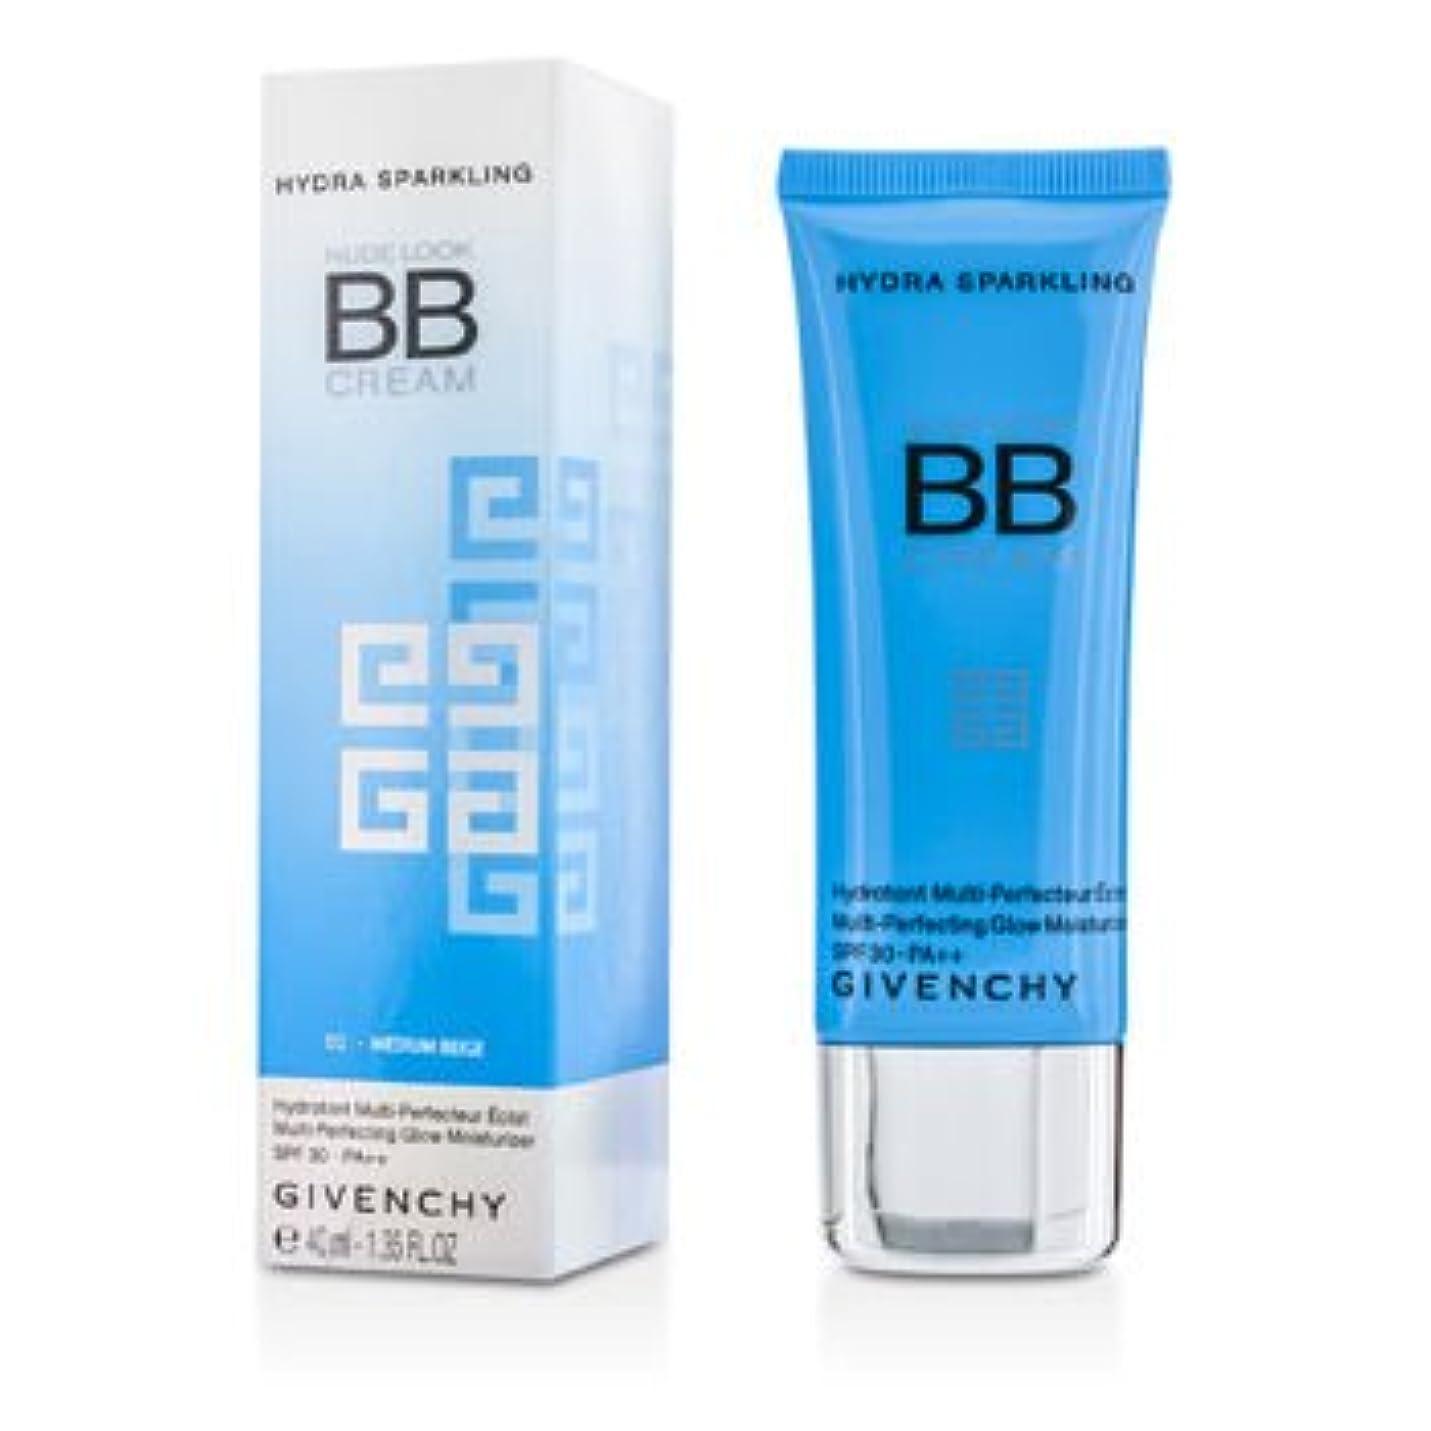 [Givenchy] Nude Look BB Cream Multi-Perfecting Glow Moisturizer SPF 30 PA++ #02 Medium Beige 40ml/1.35oz